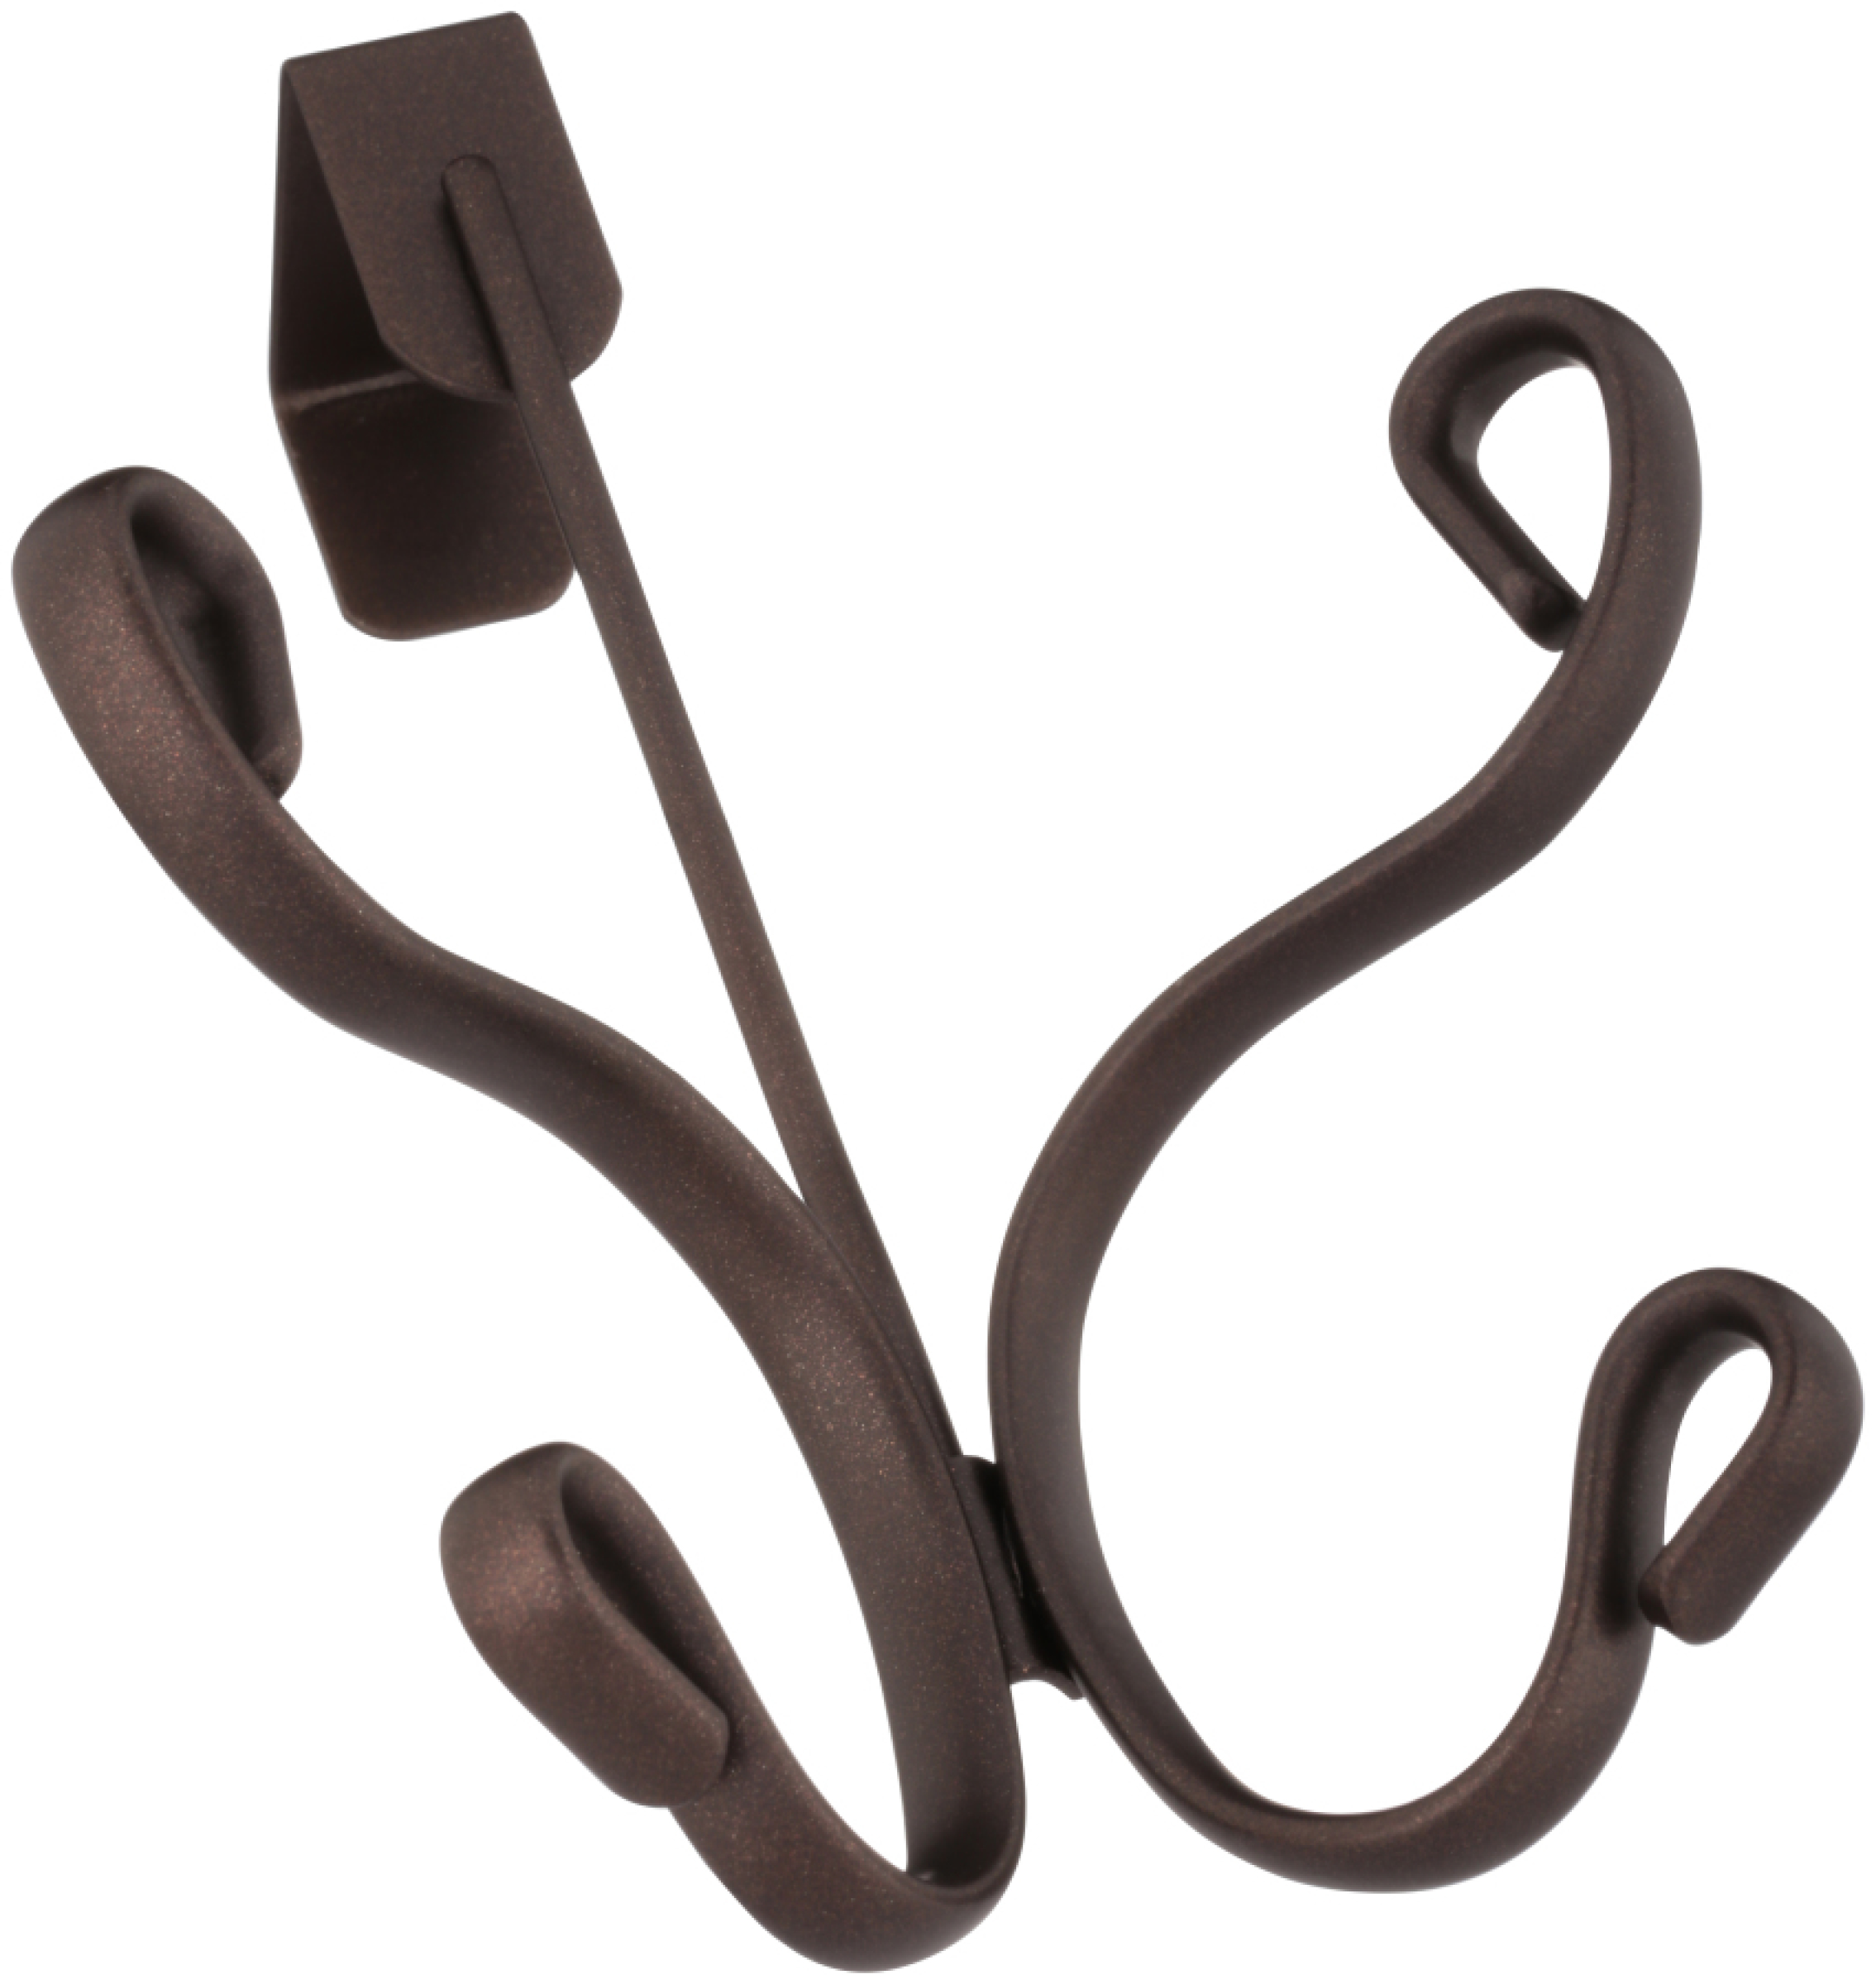 InterDesign® Over Door Quad Hook Carded Pack